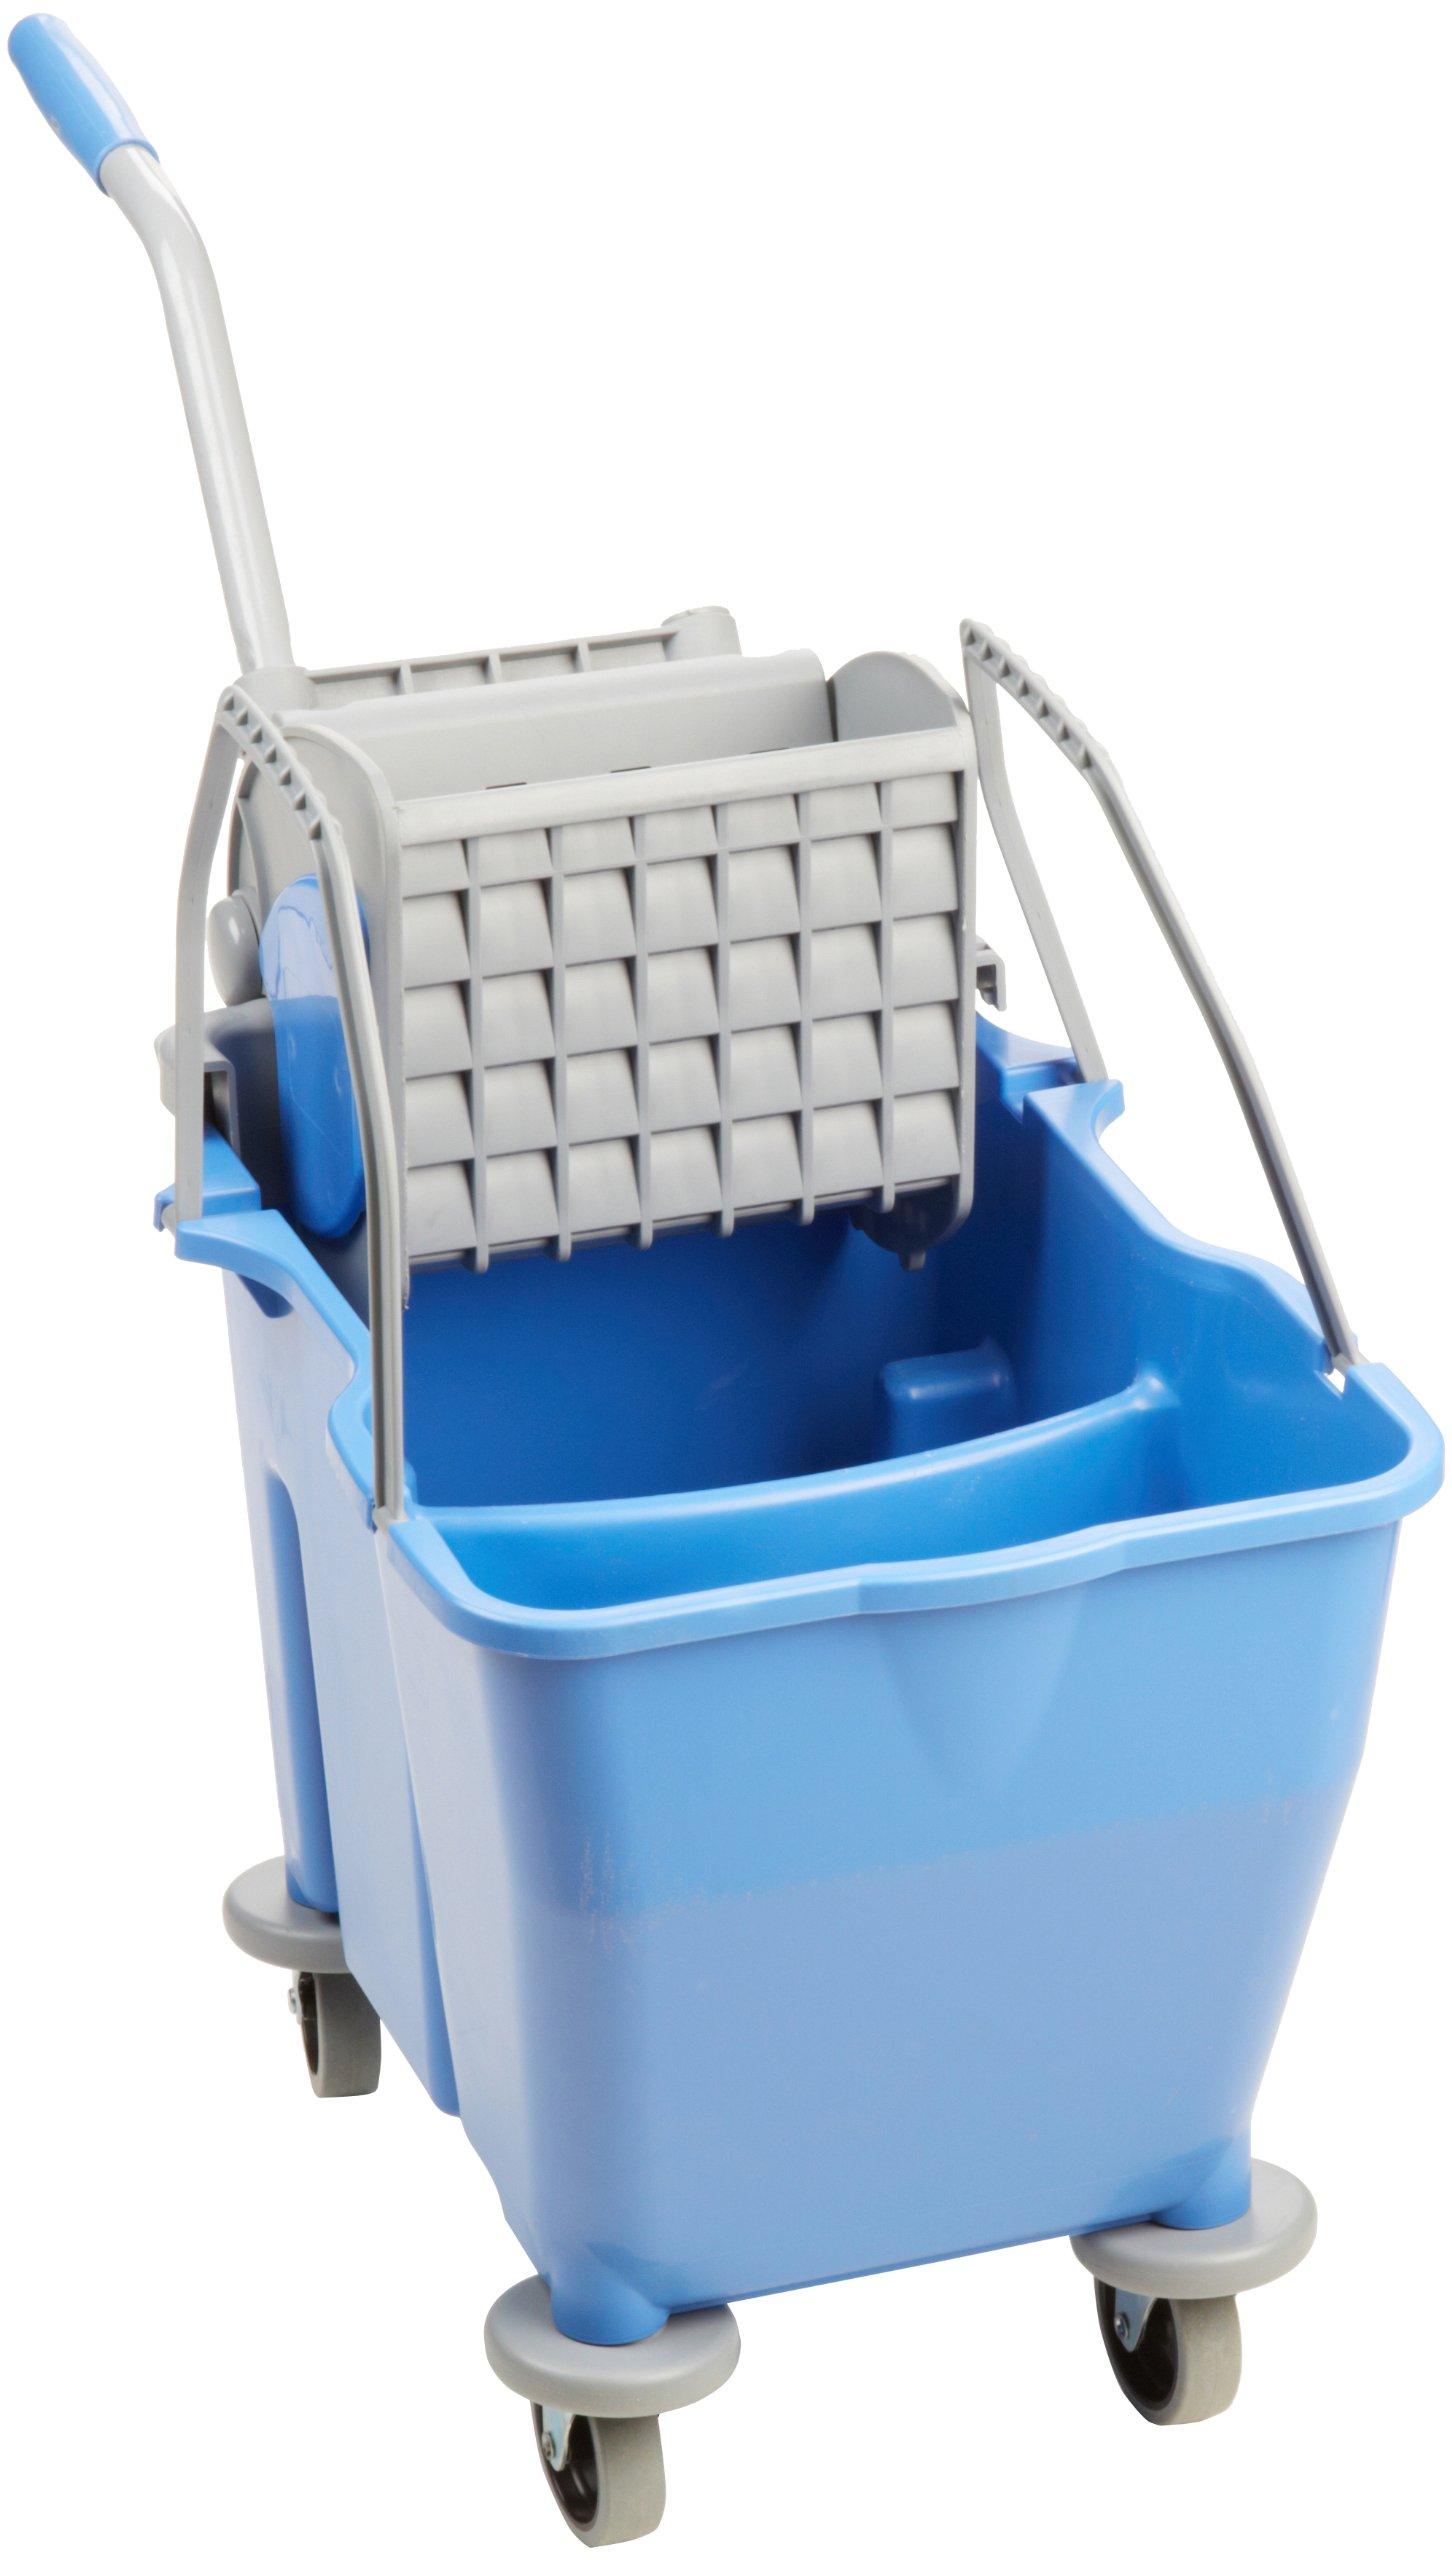 O'Dell 30 QT. Dual Chamber Bucket, Blue, Side Press Wringer MWMF30B-SP